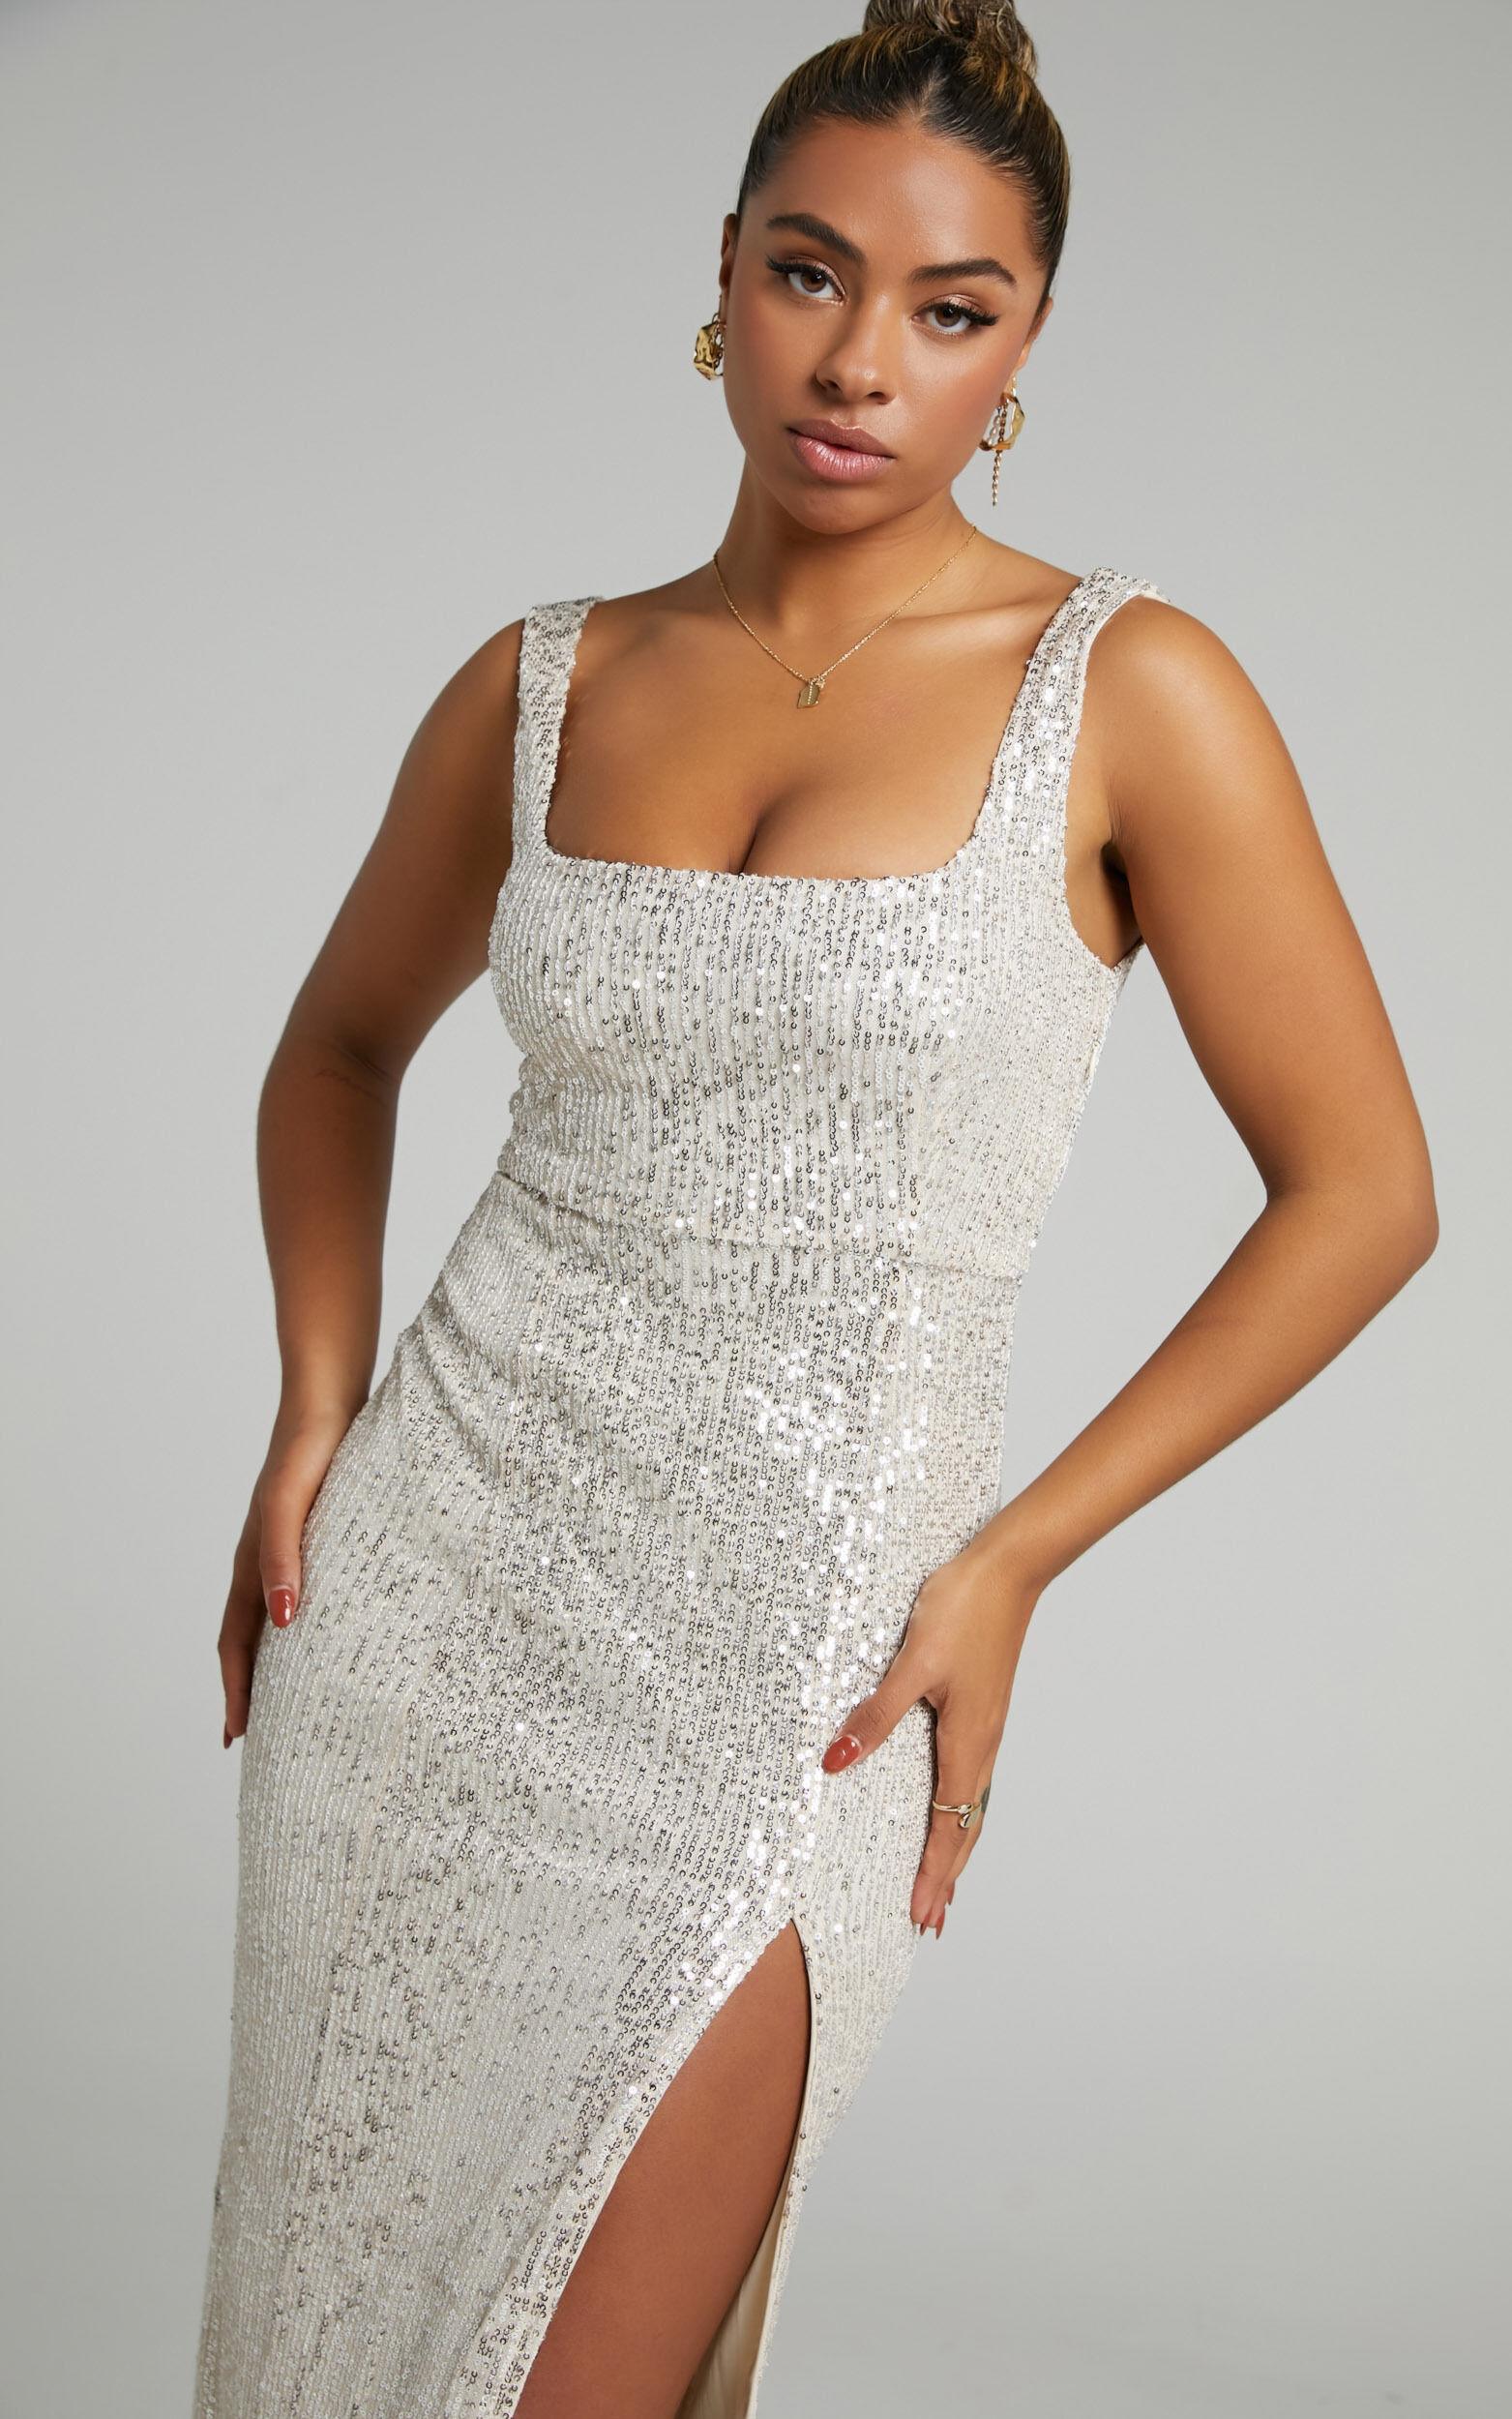 Glimmer Love Square Neck Midi Dress in Gold Sequin - 06, GLD1, super-hi-res image number null